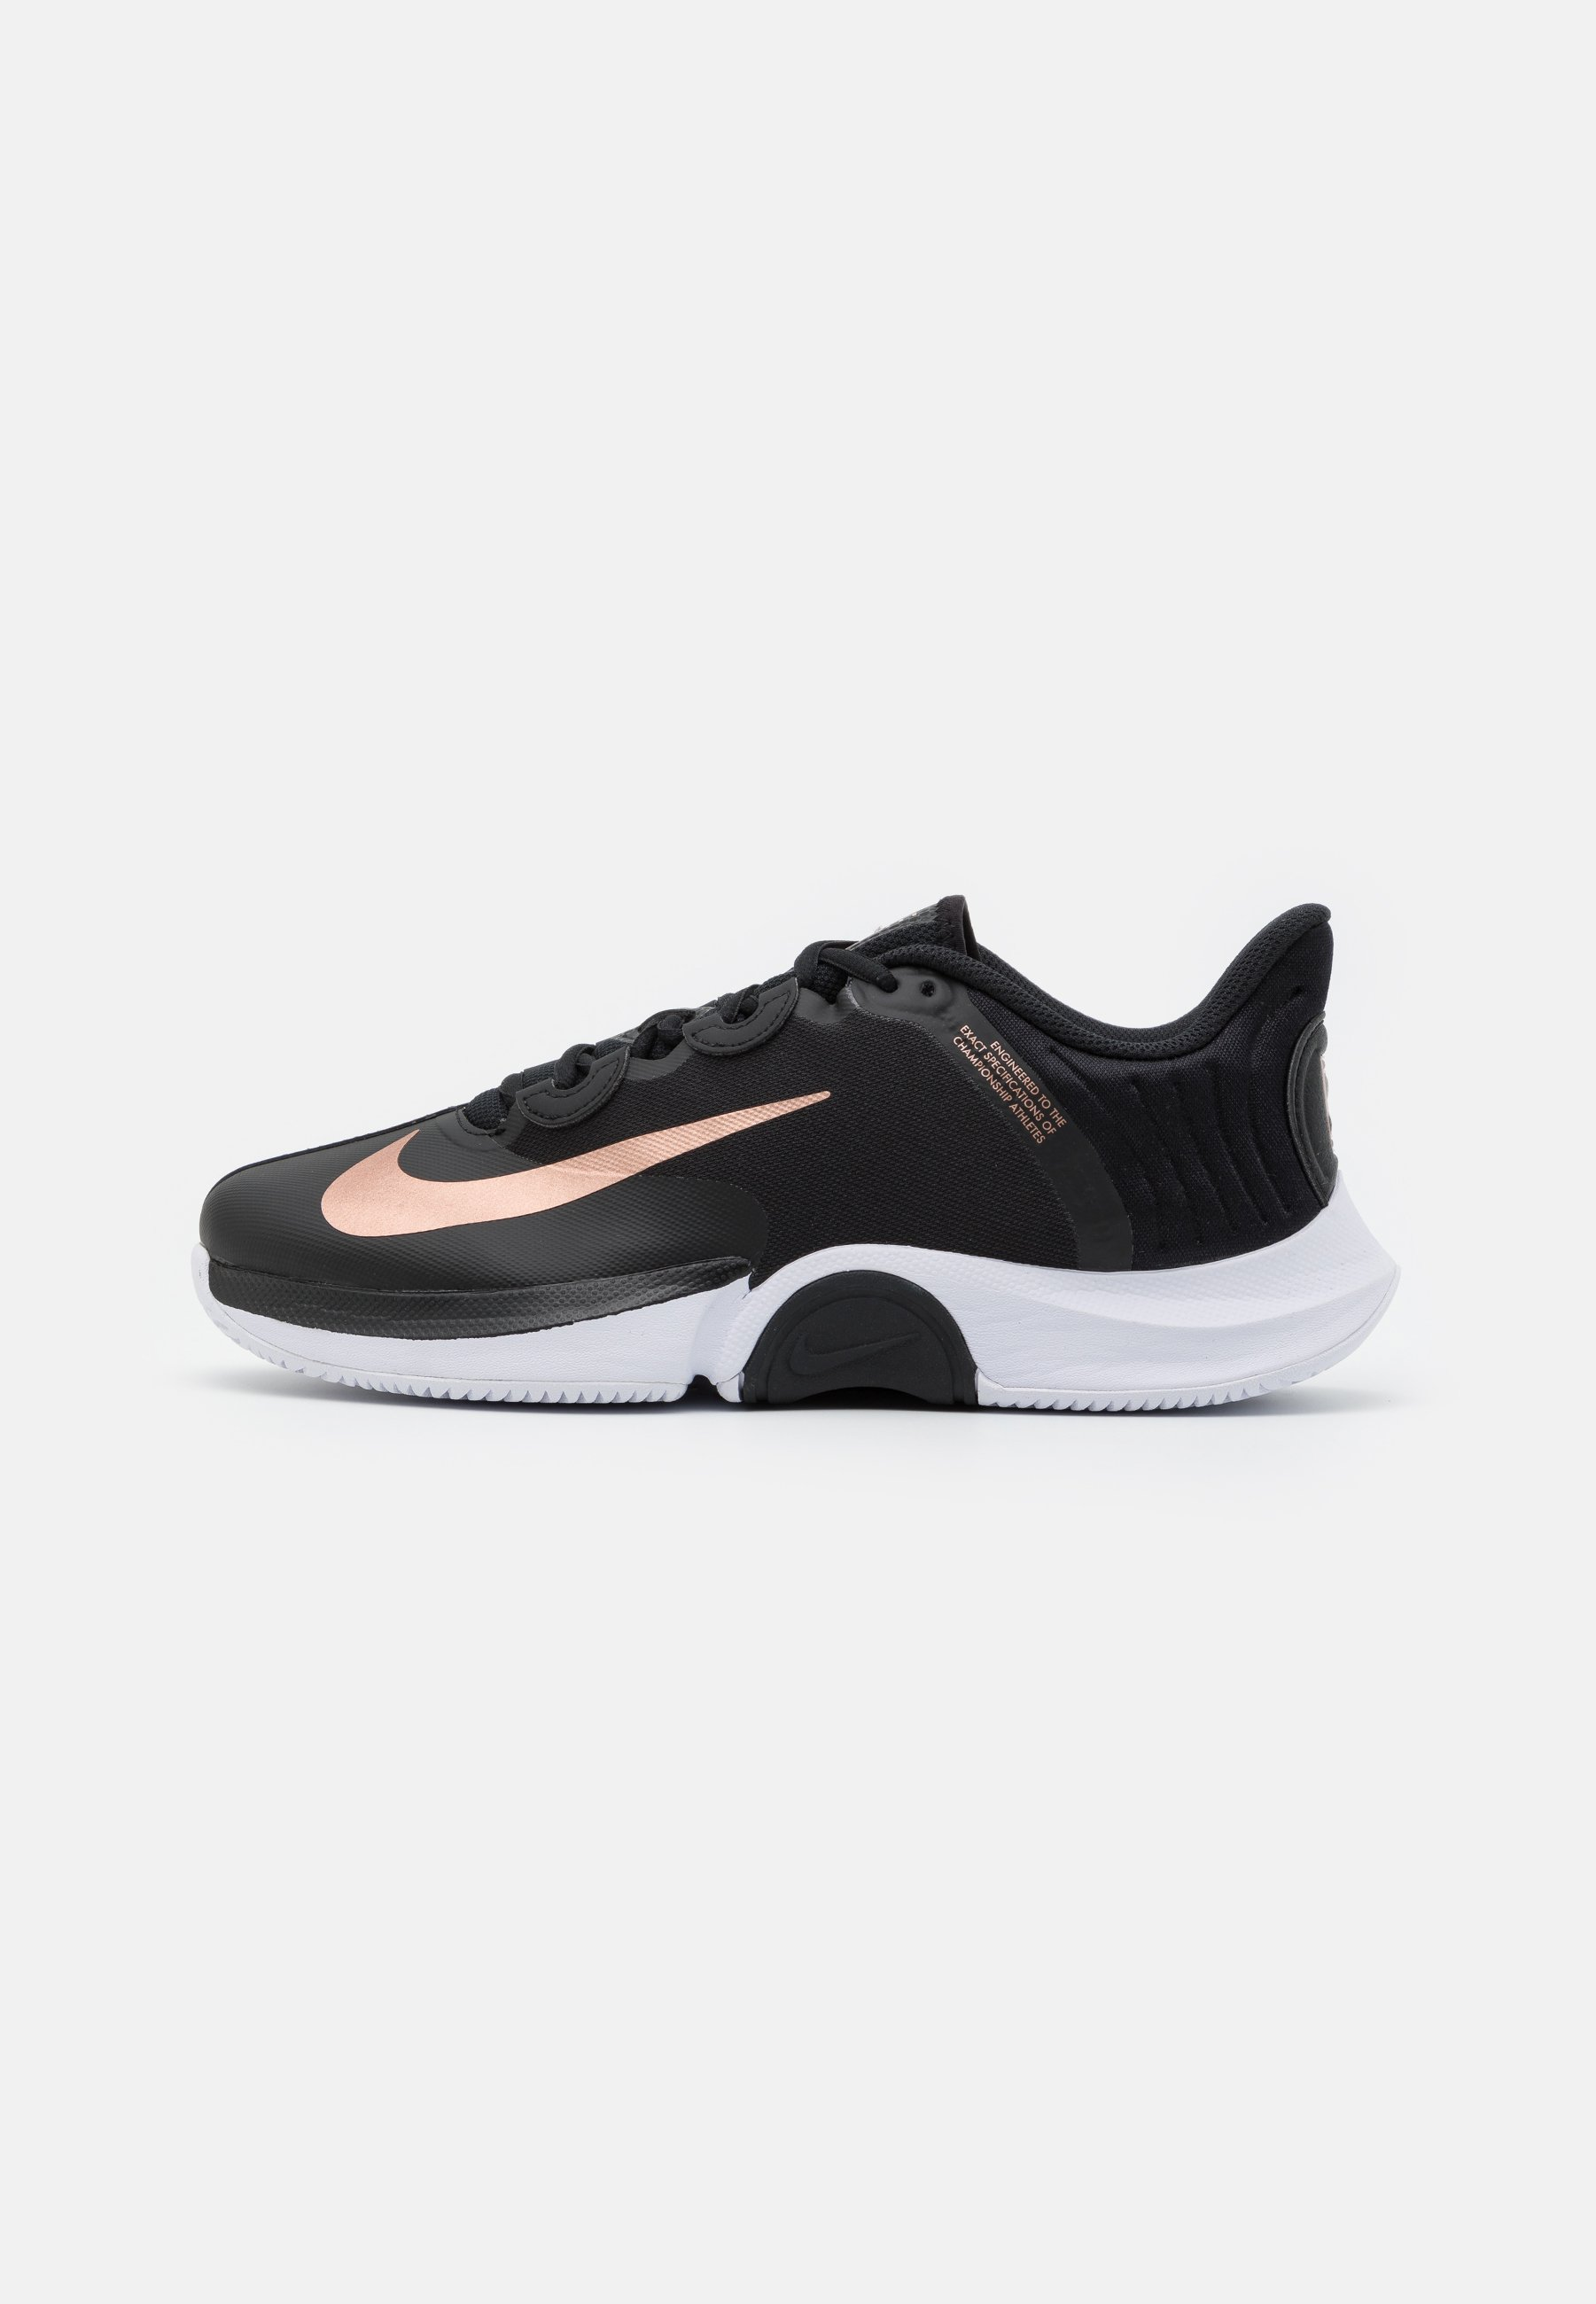 Women COURT AIR ZOOM TURBO - Multicourt tennis shoes